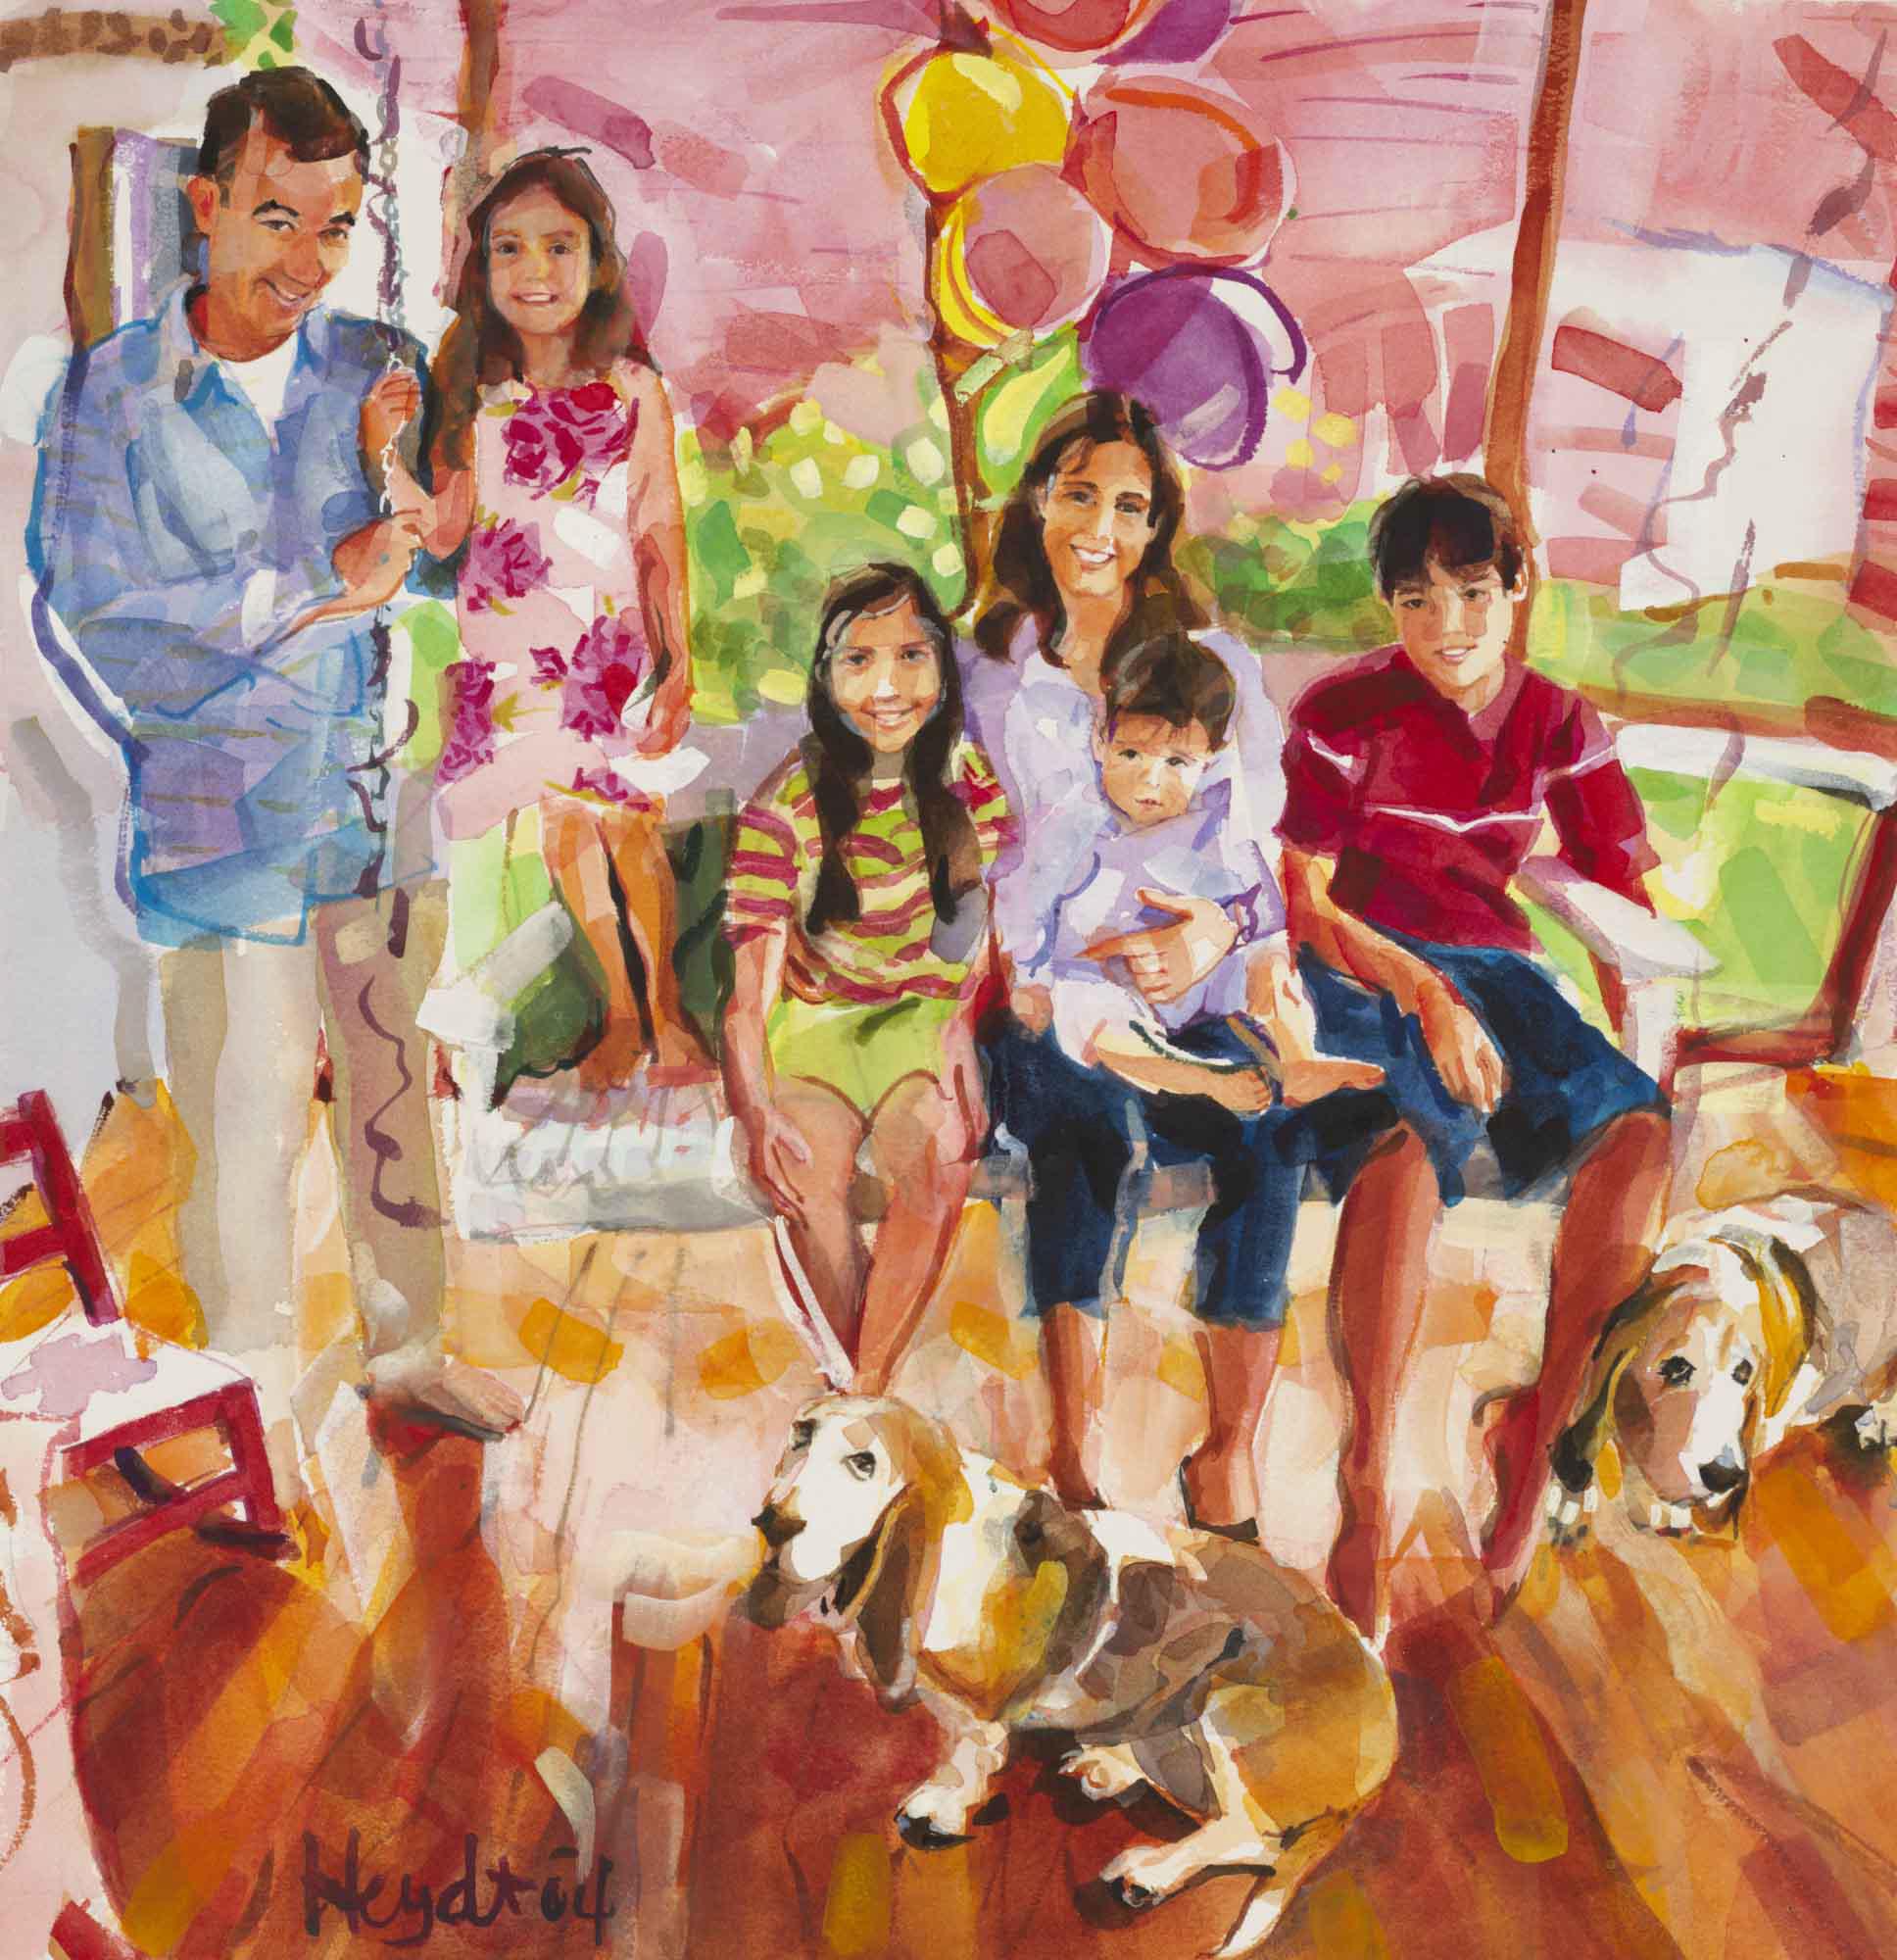 NewportantIII-Family Portrait birthday party.jpg